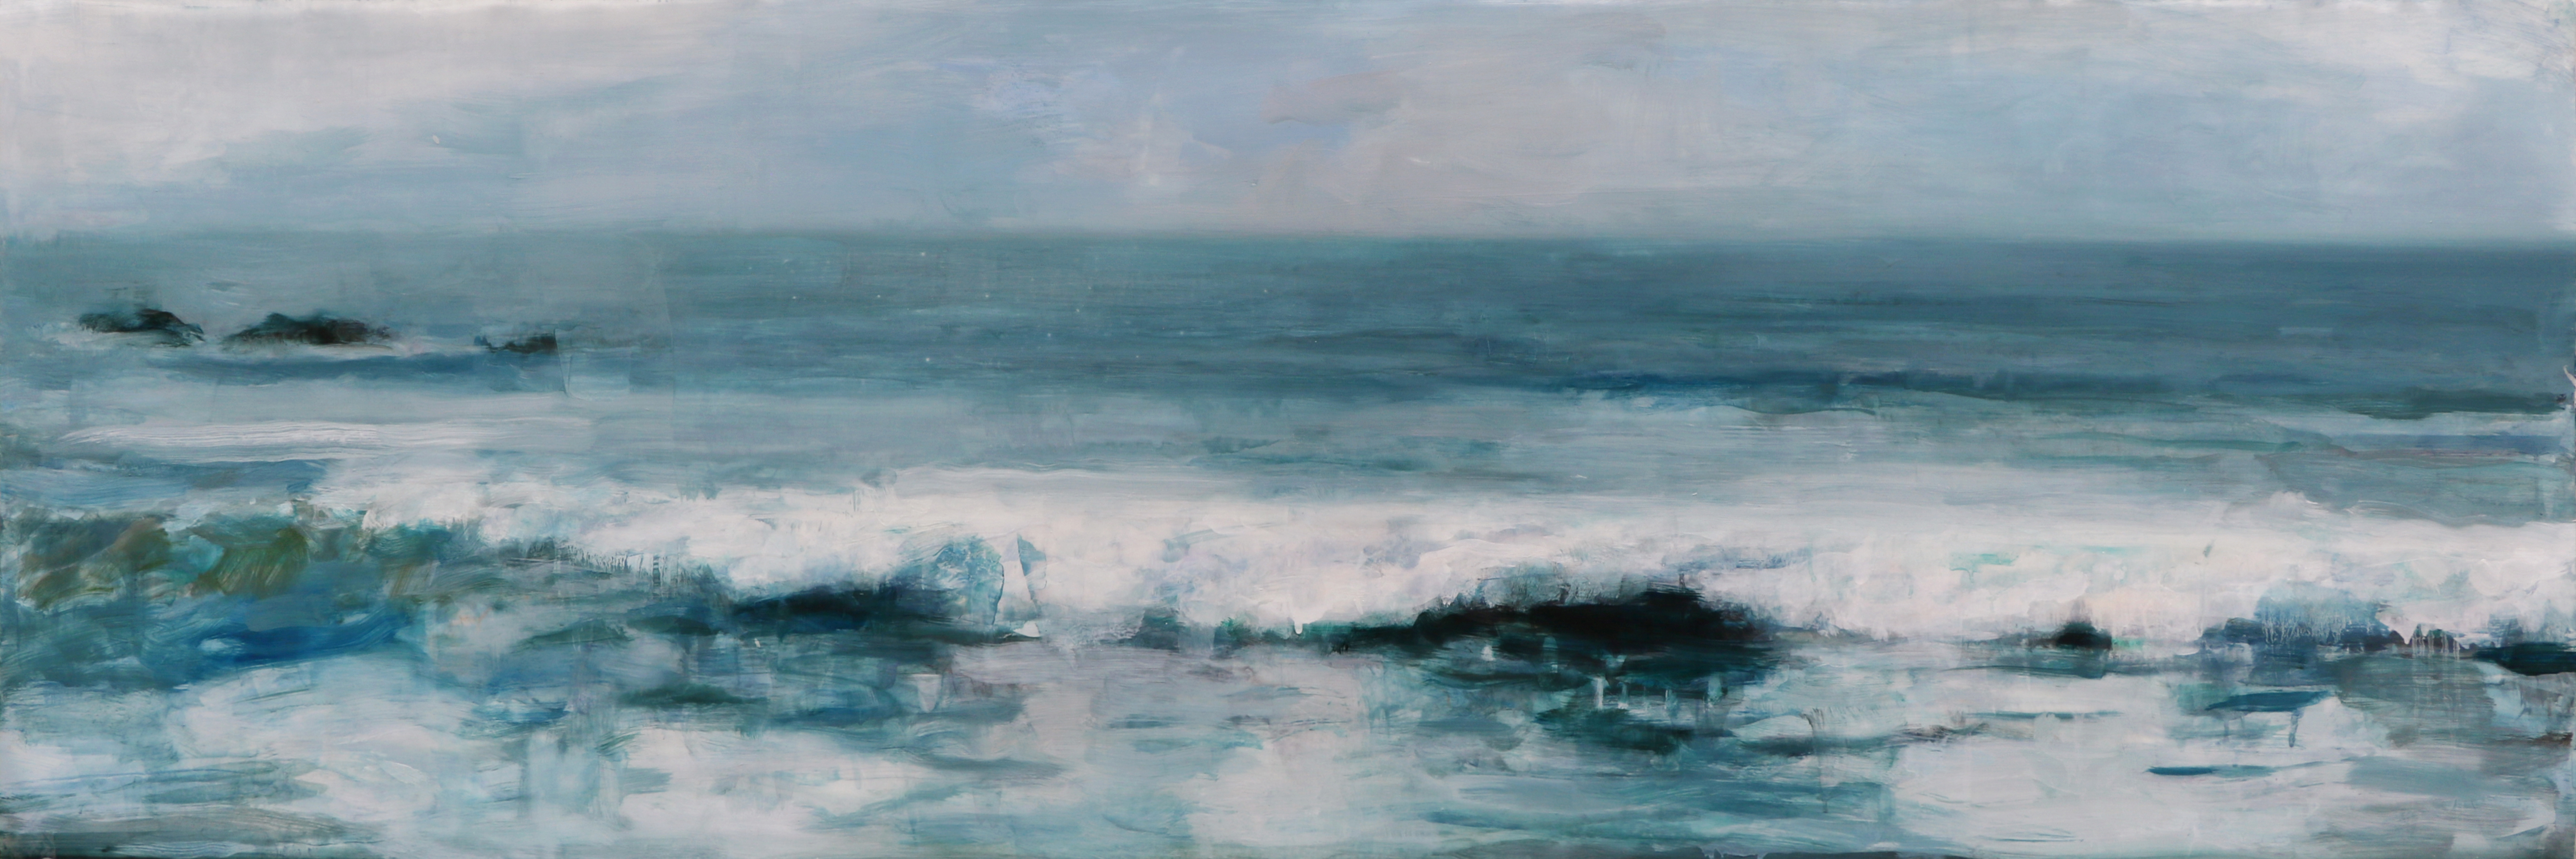 Big Wave 3